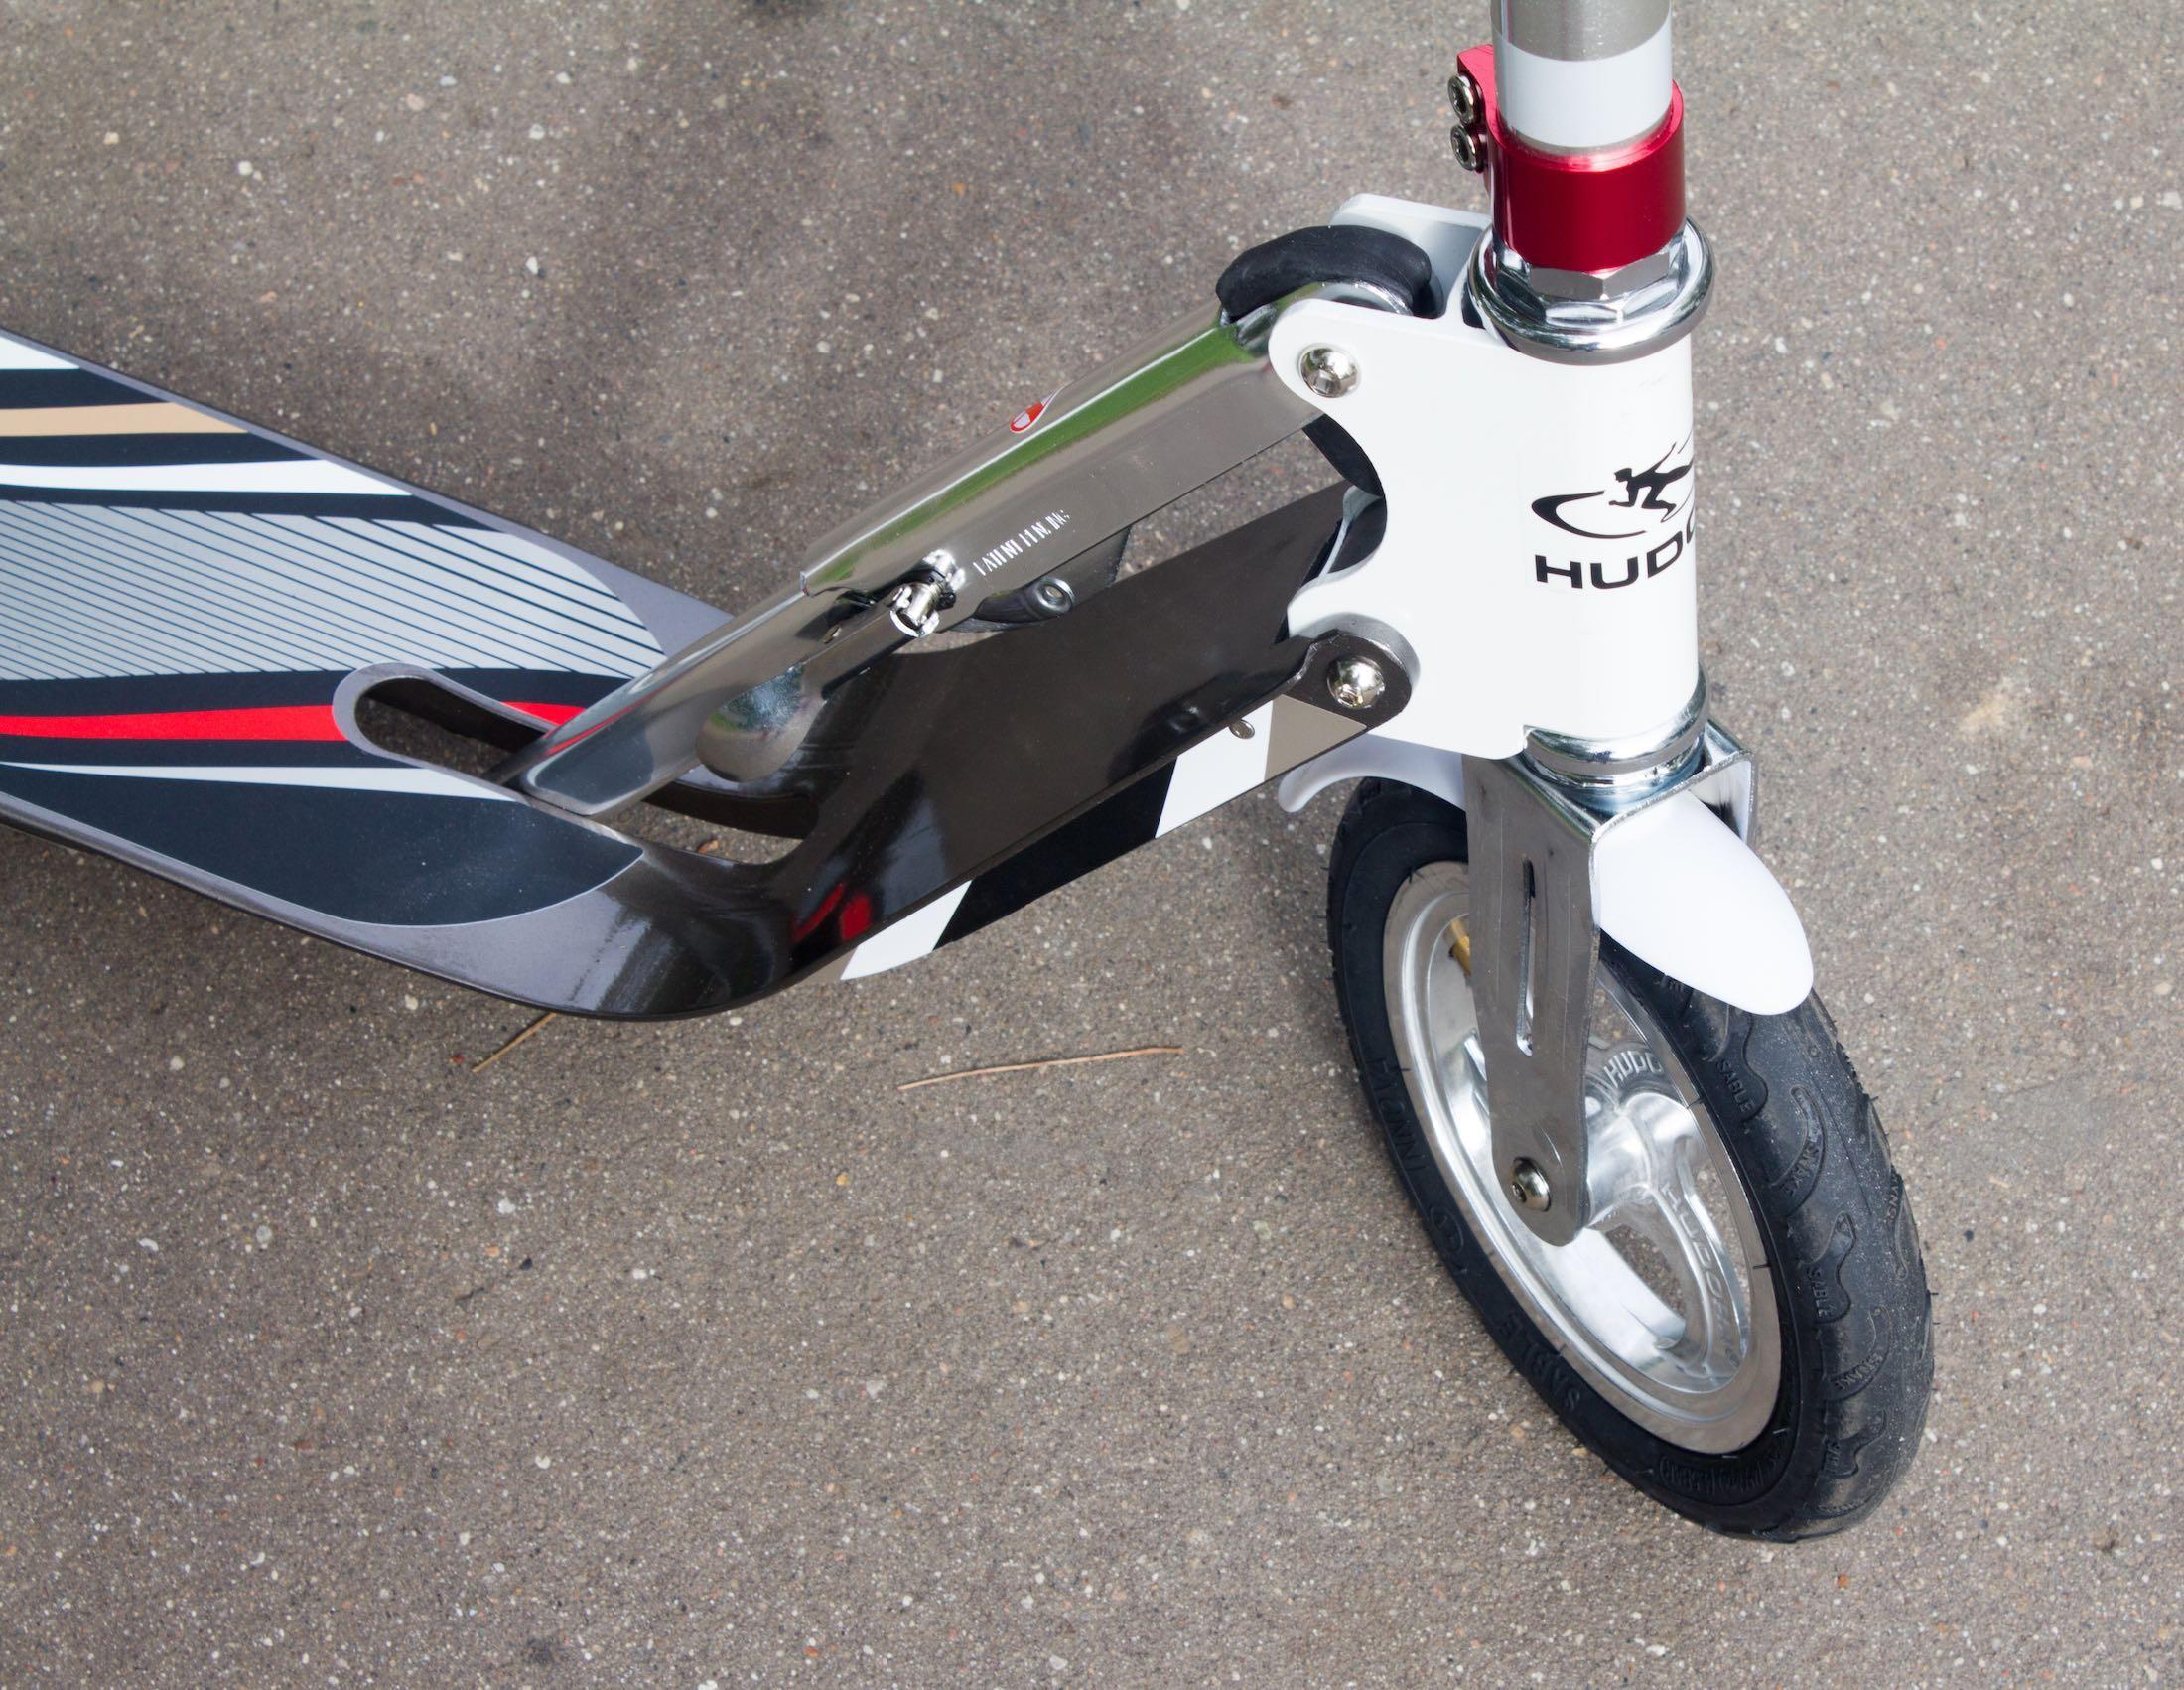 Hudora Big Wheel Air 205 Russia Review 17